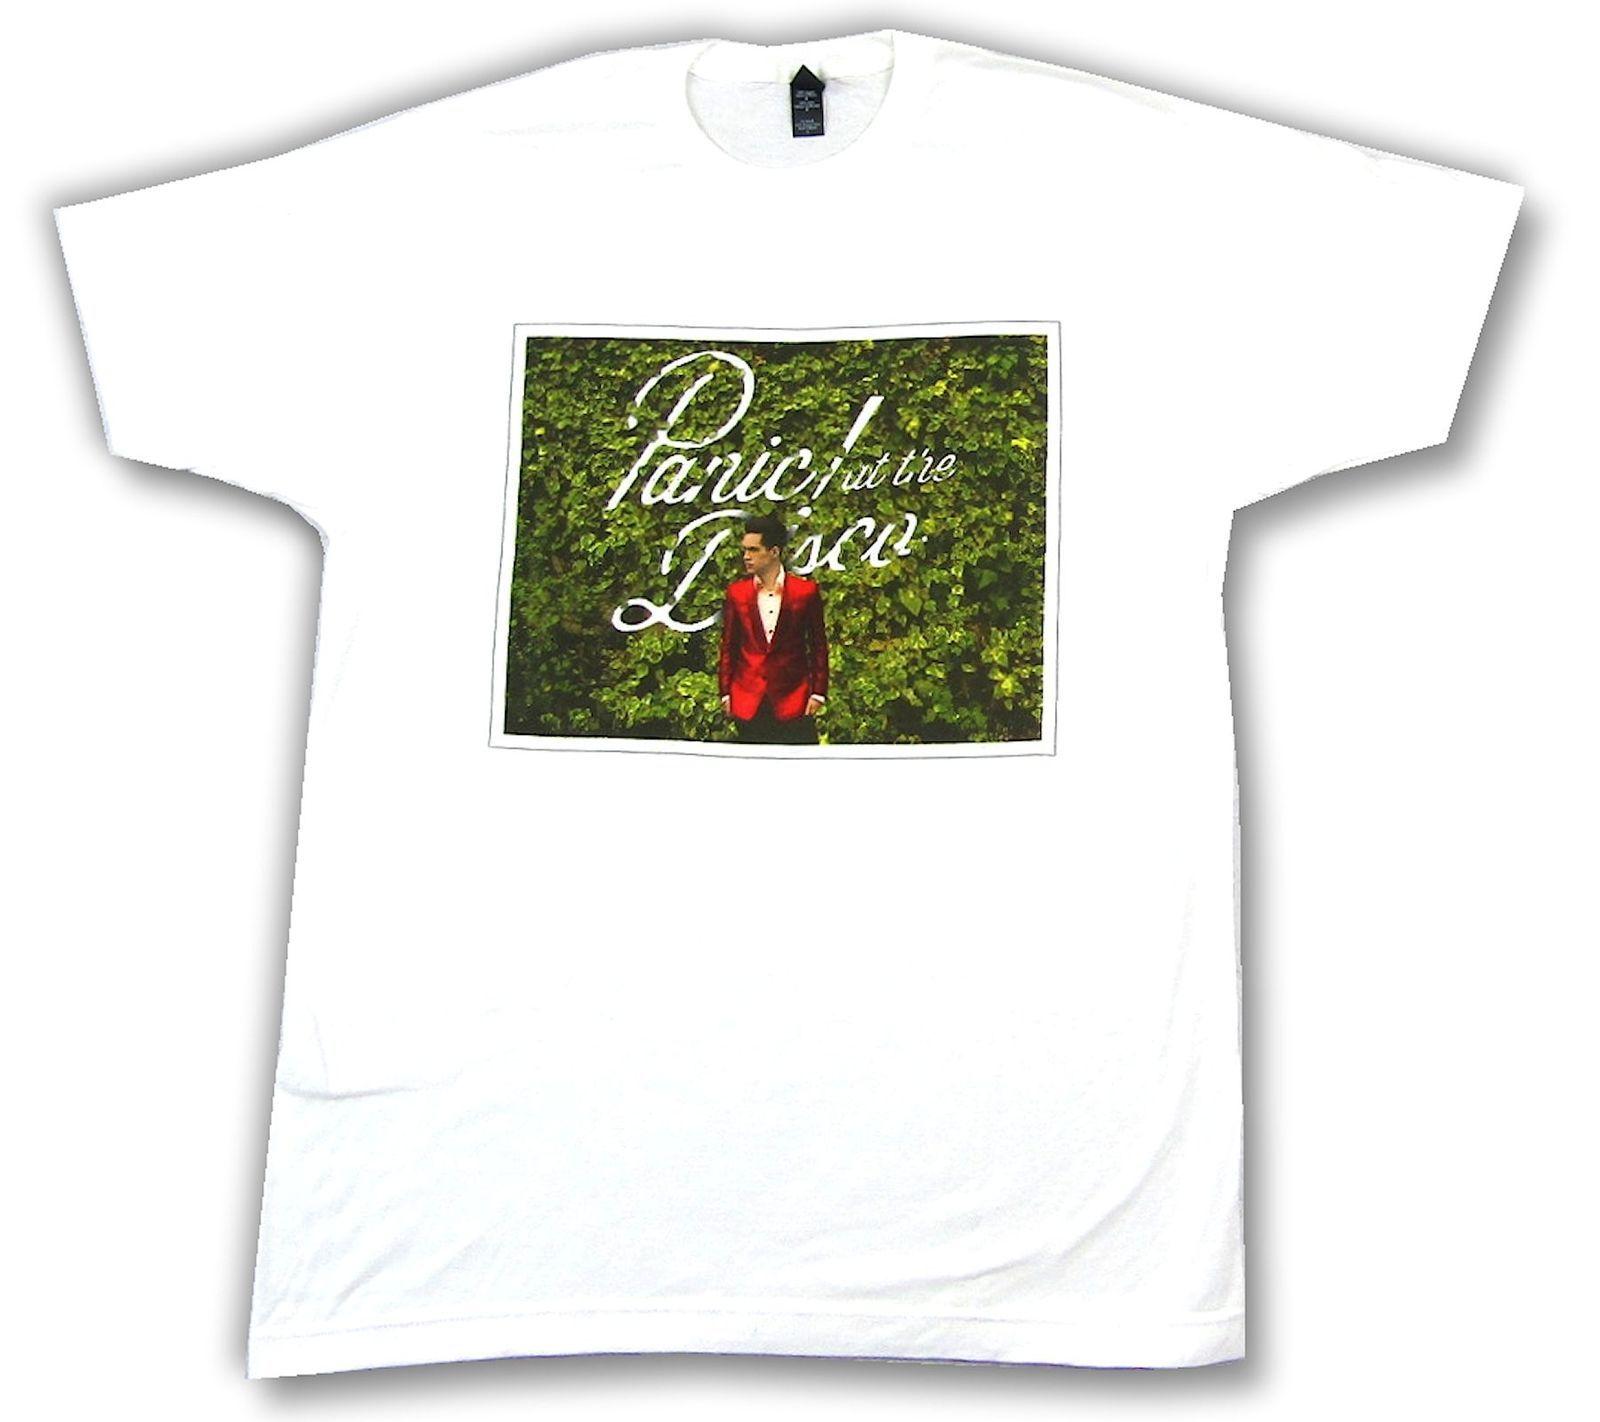 b88bb06c Panic At The Disco Bush Photo Brendan White T Shirt New Official Band Merch  Design Shirt Formal Shirt From Mandadi, $11.22| DHgate.Com